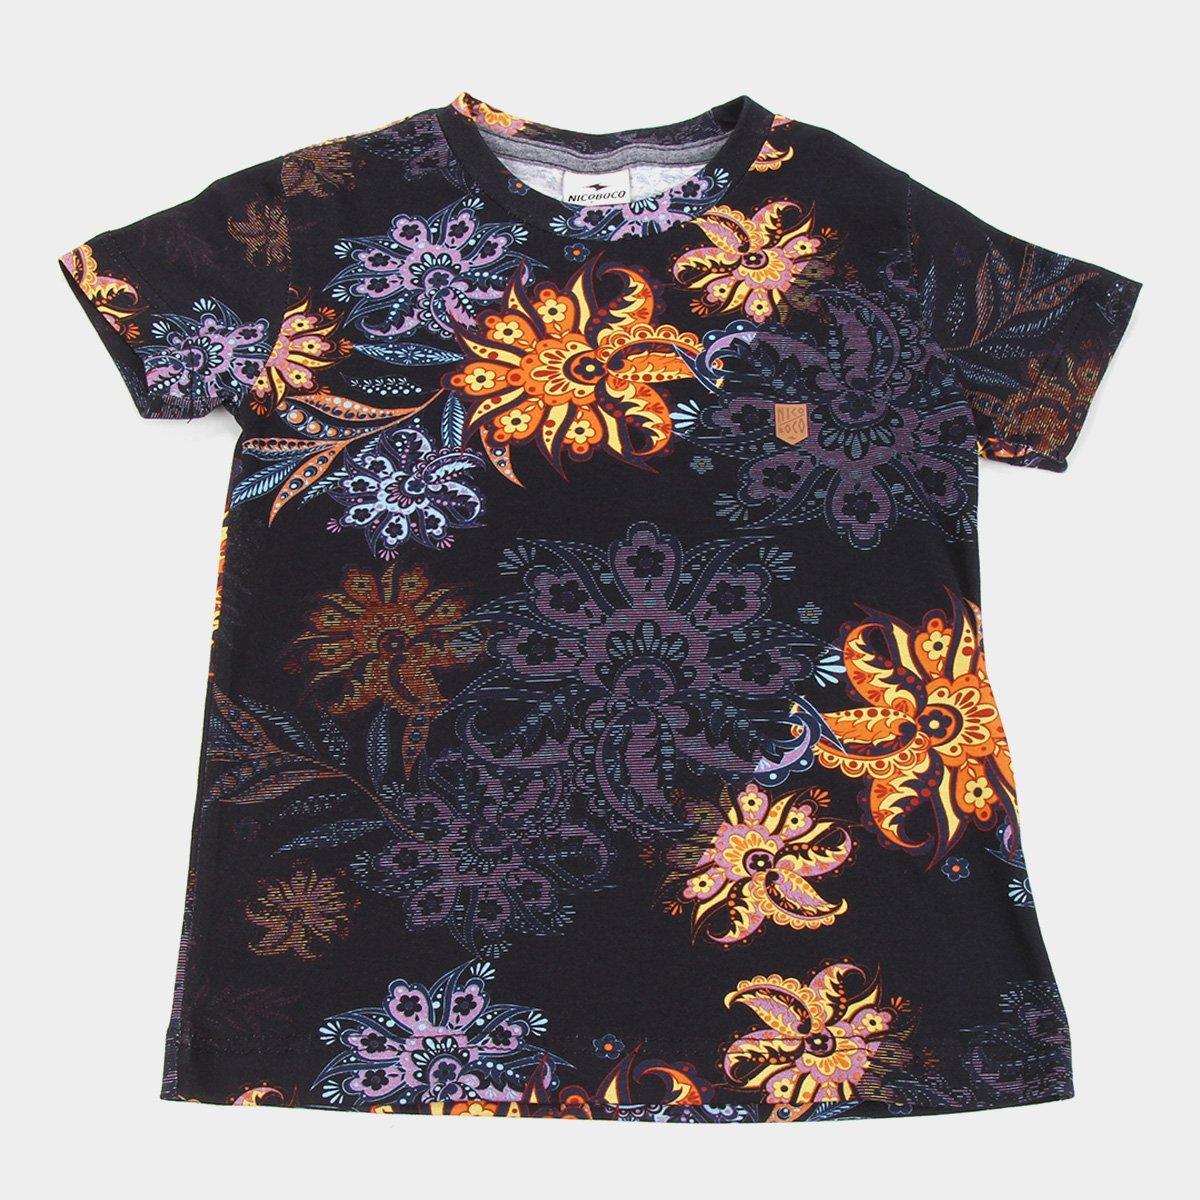 Camiseta Digital Infantil Nicoboco Empoleon Masculina